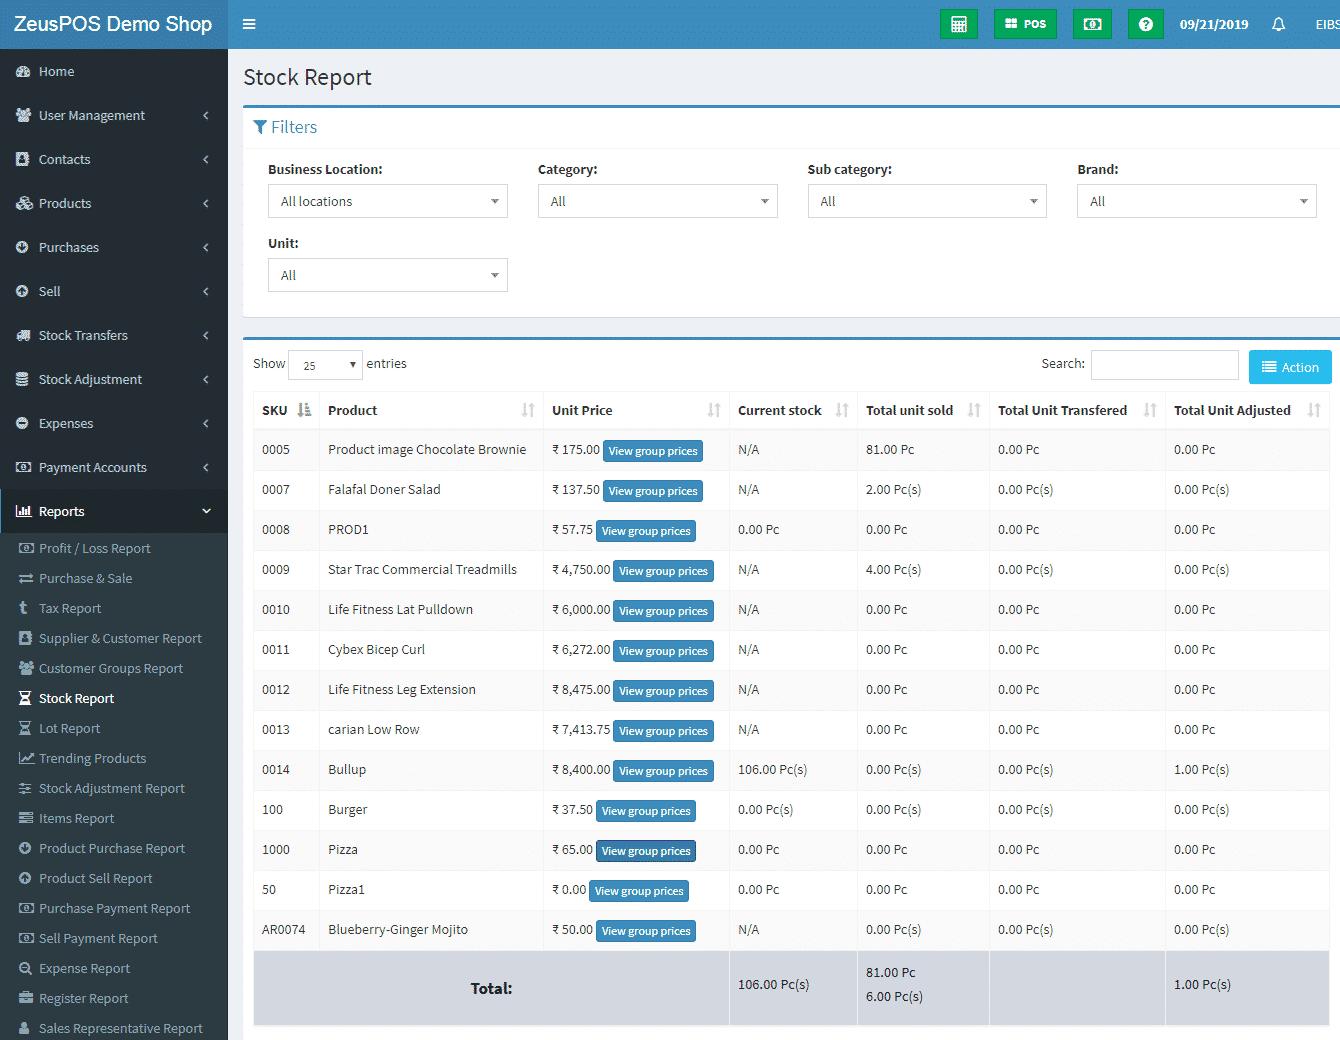 stock_report